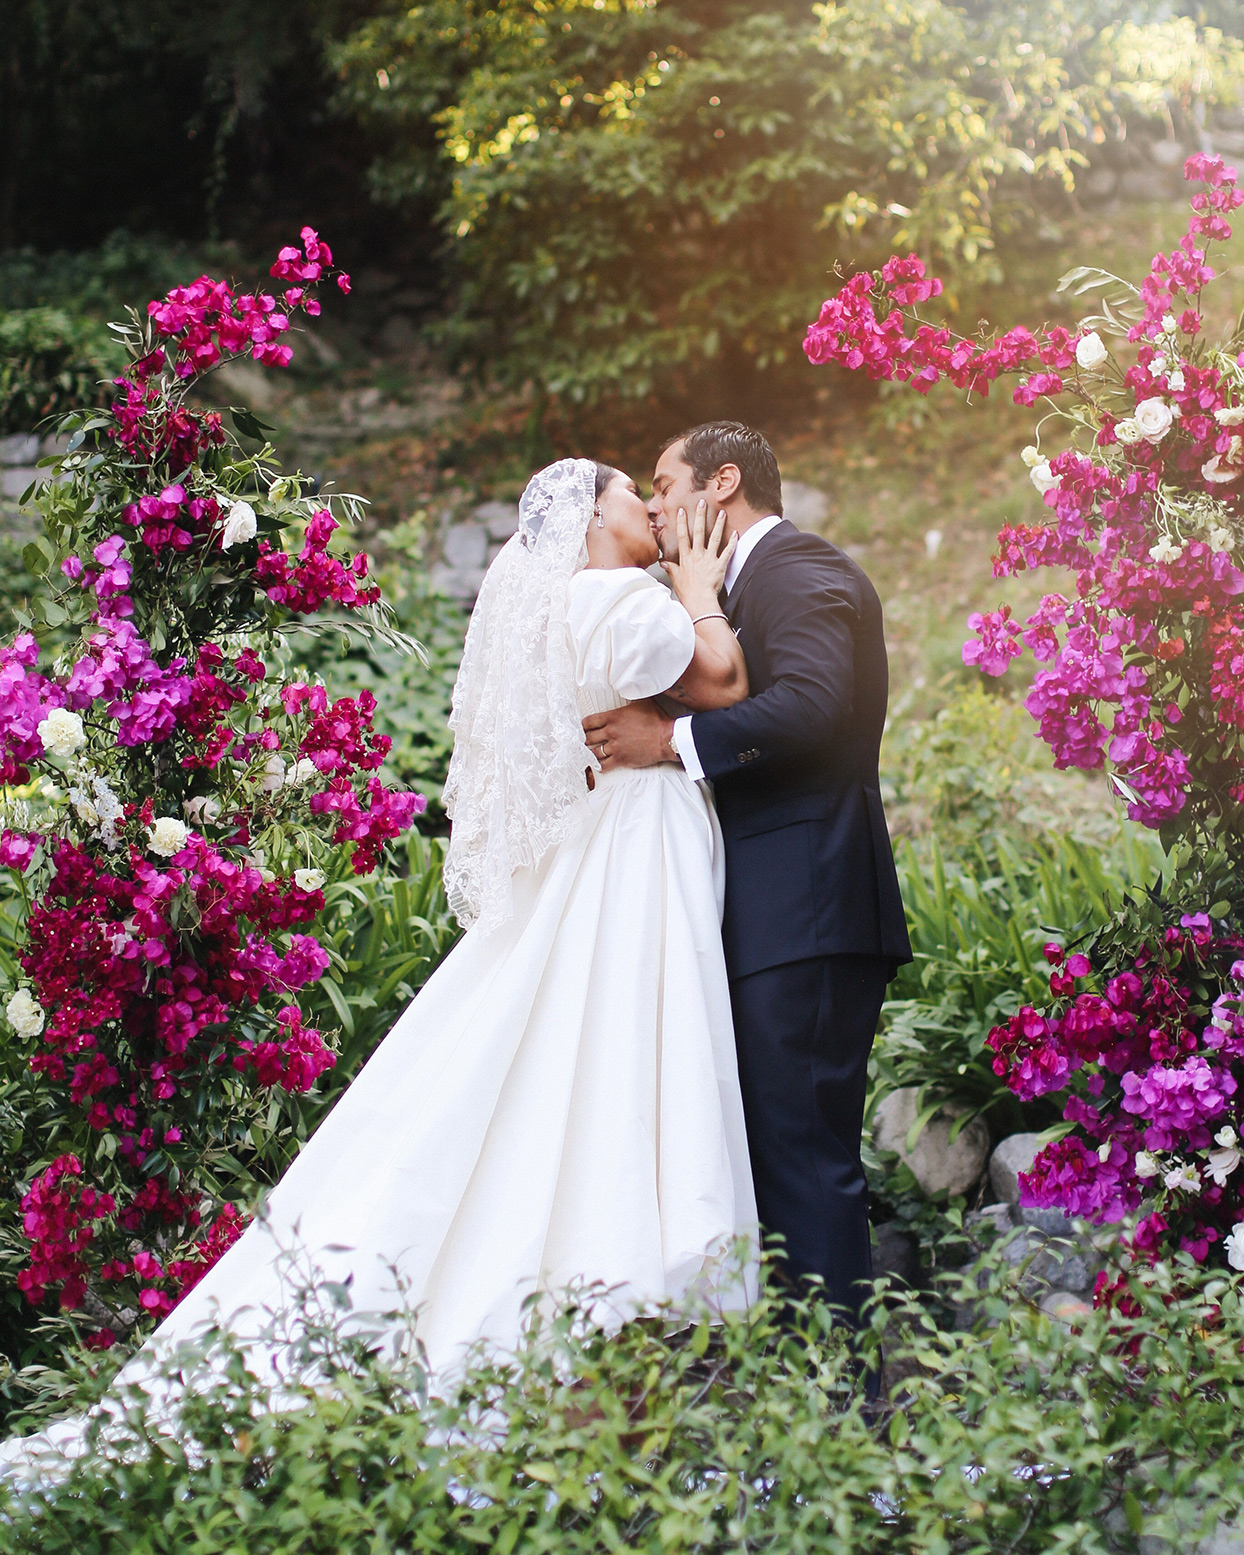 pia davide wedding ceremony kiss amongst fuchsia flowers